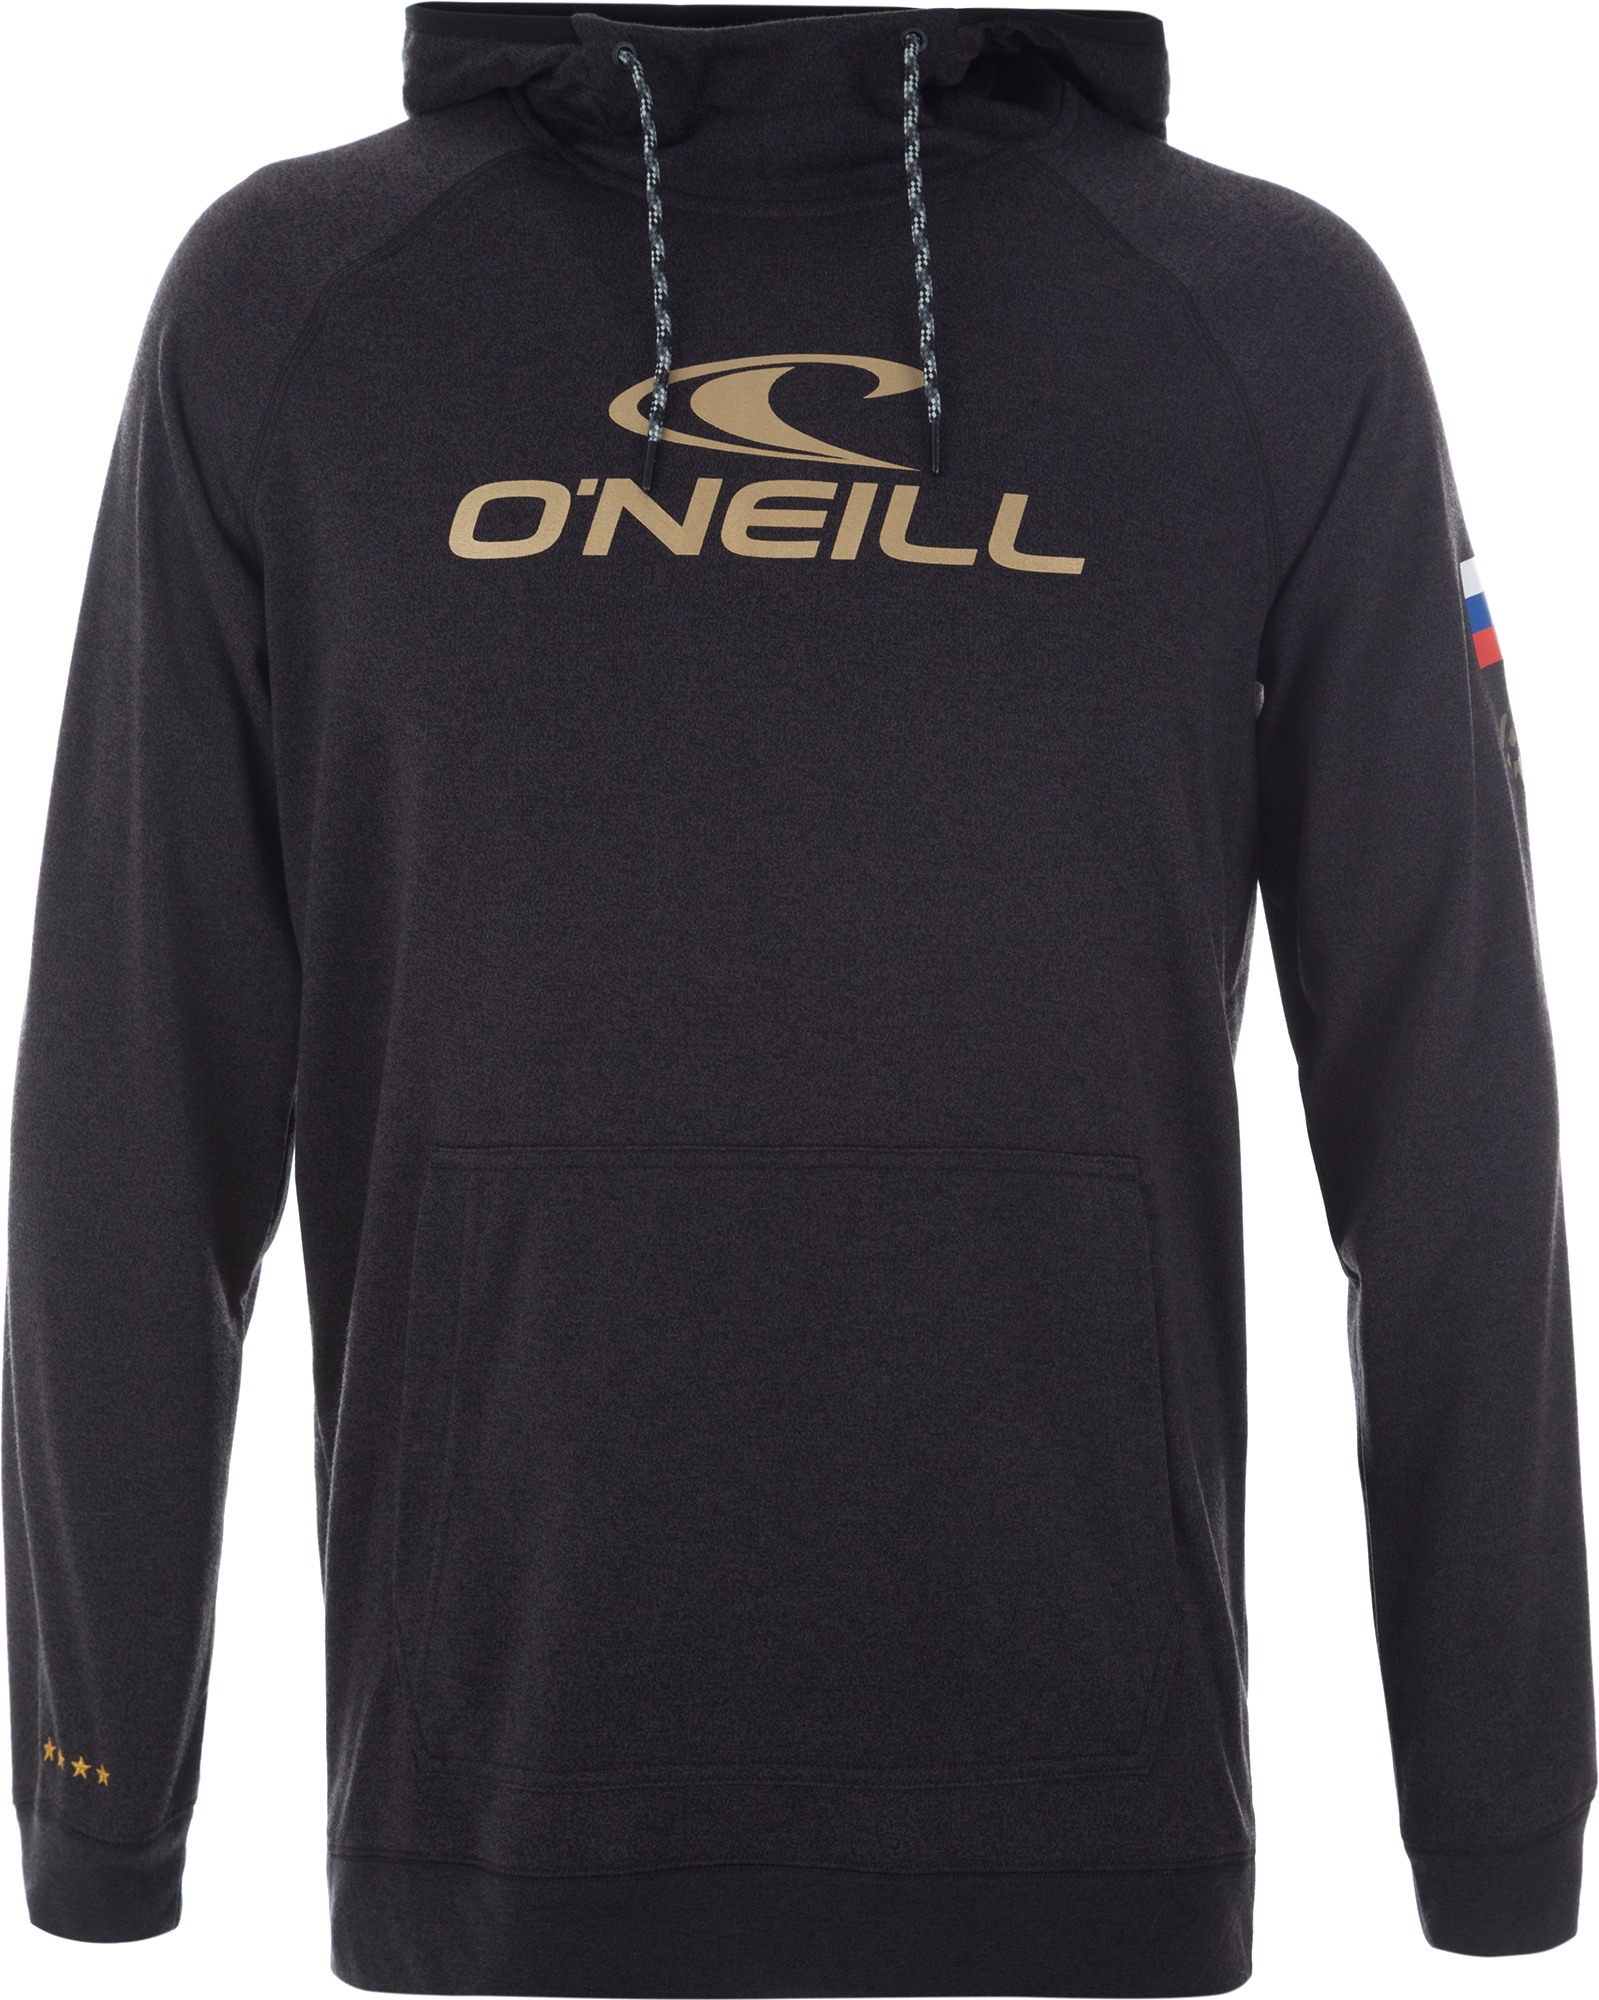 O'Neill Джемпер мужской O'Neill Olympic o neill шорты мужские o neill complex